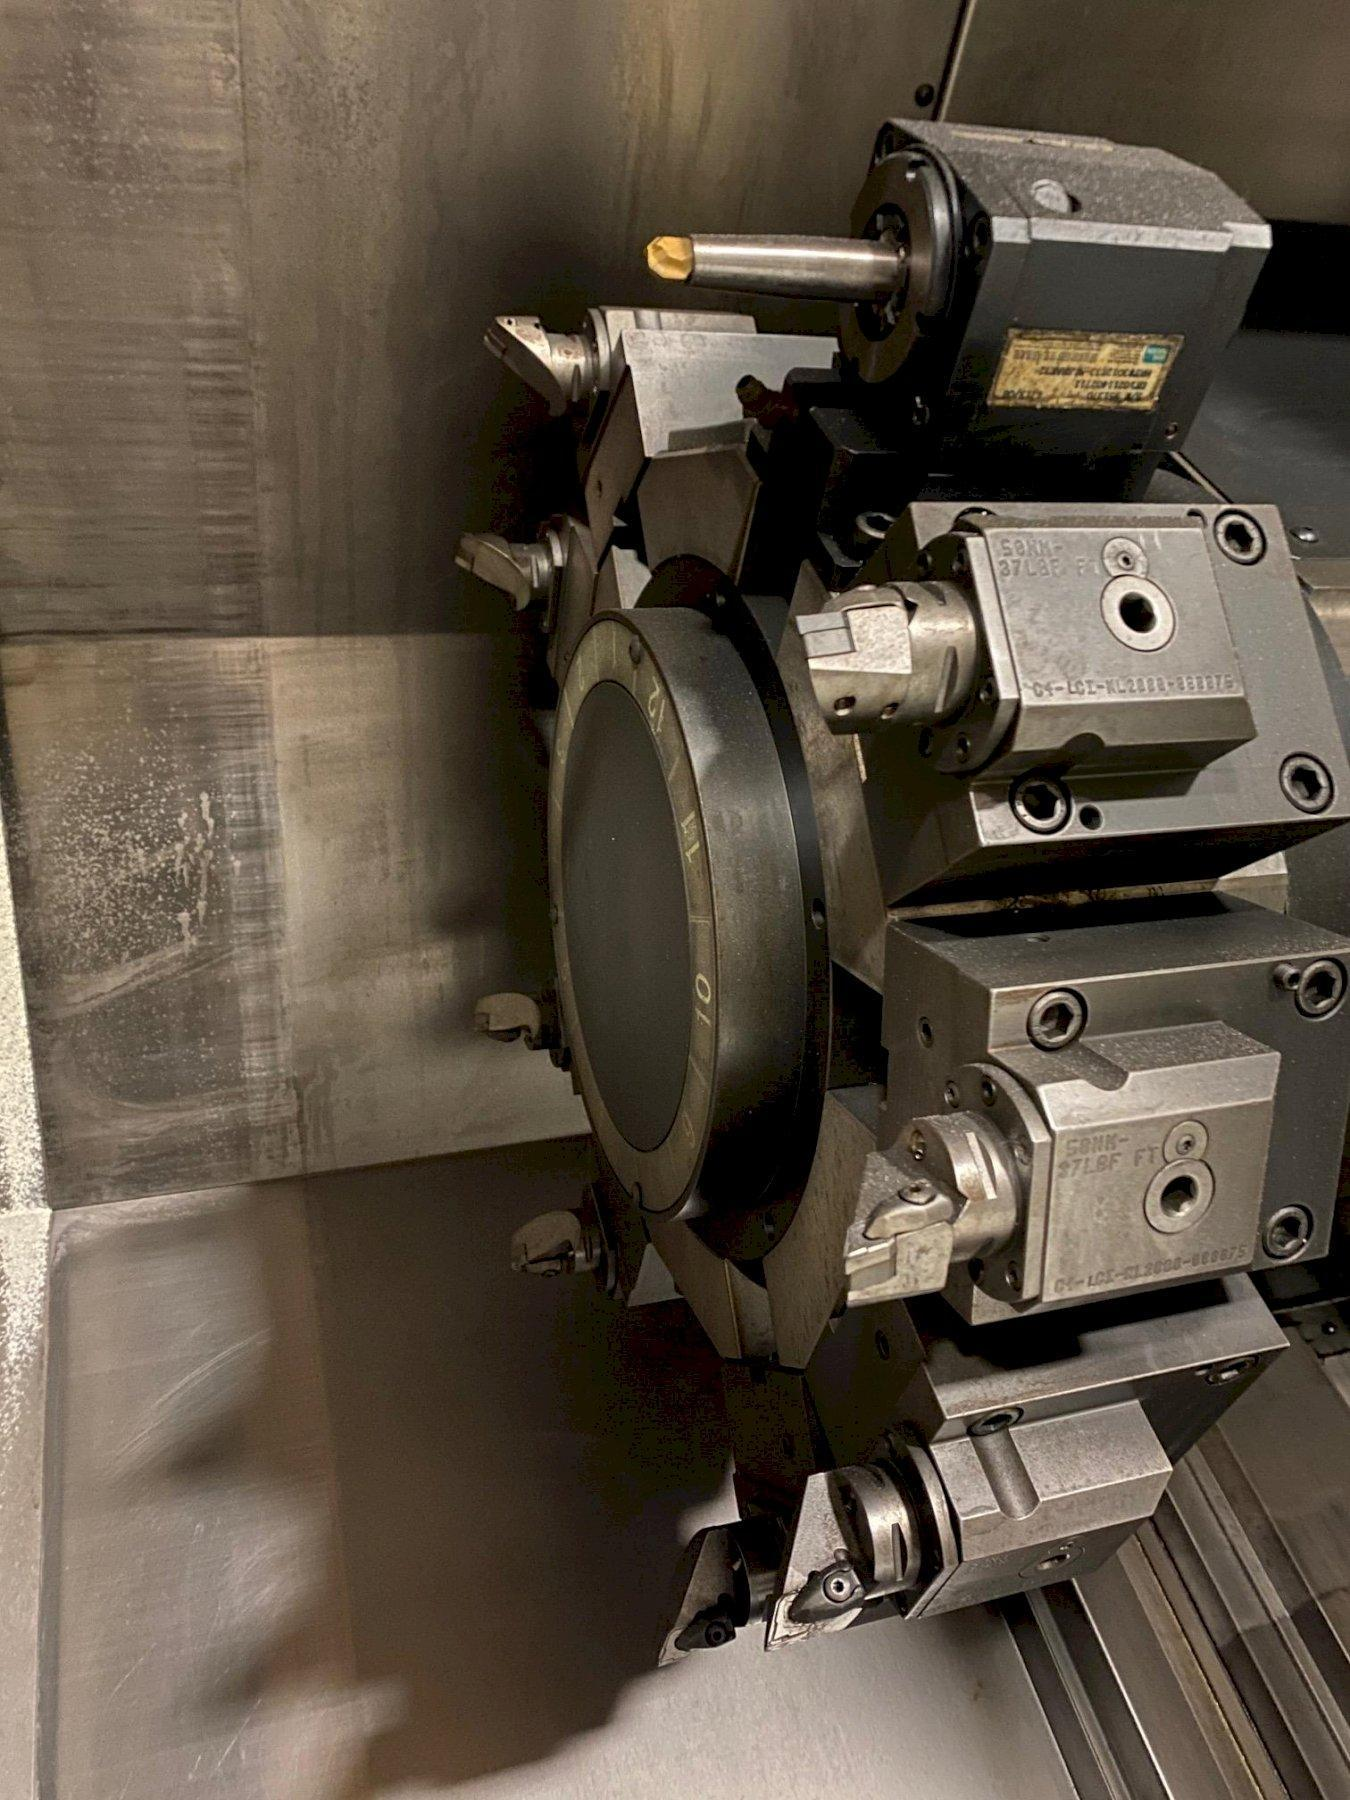 2008 Mori Seiki NL2500MC/700 CNC Horizontal Lathe